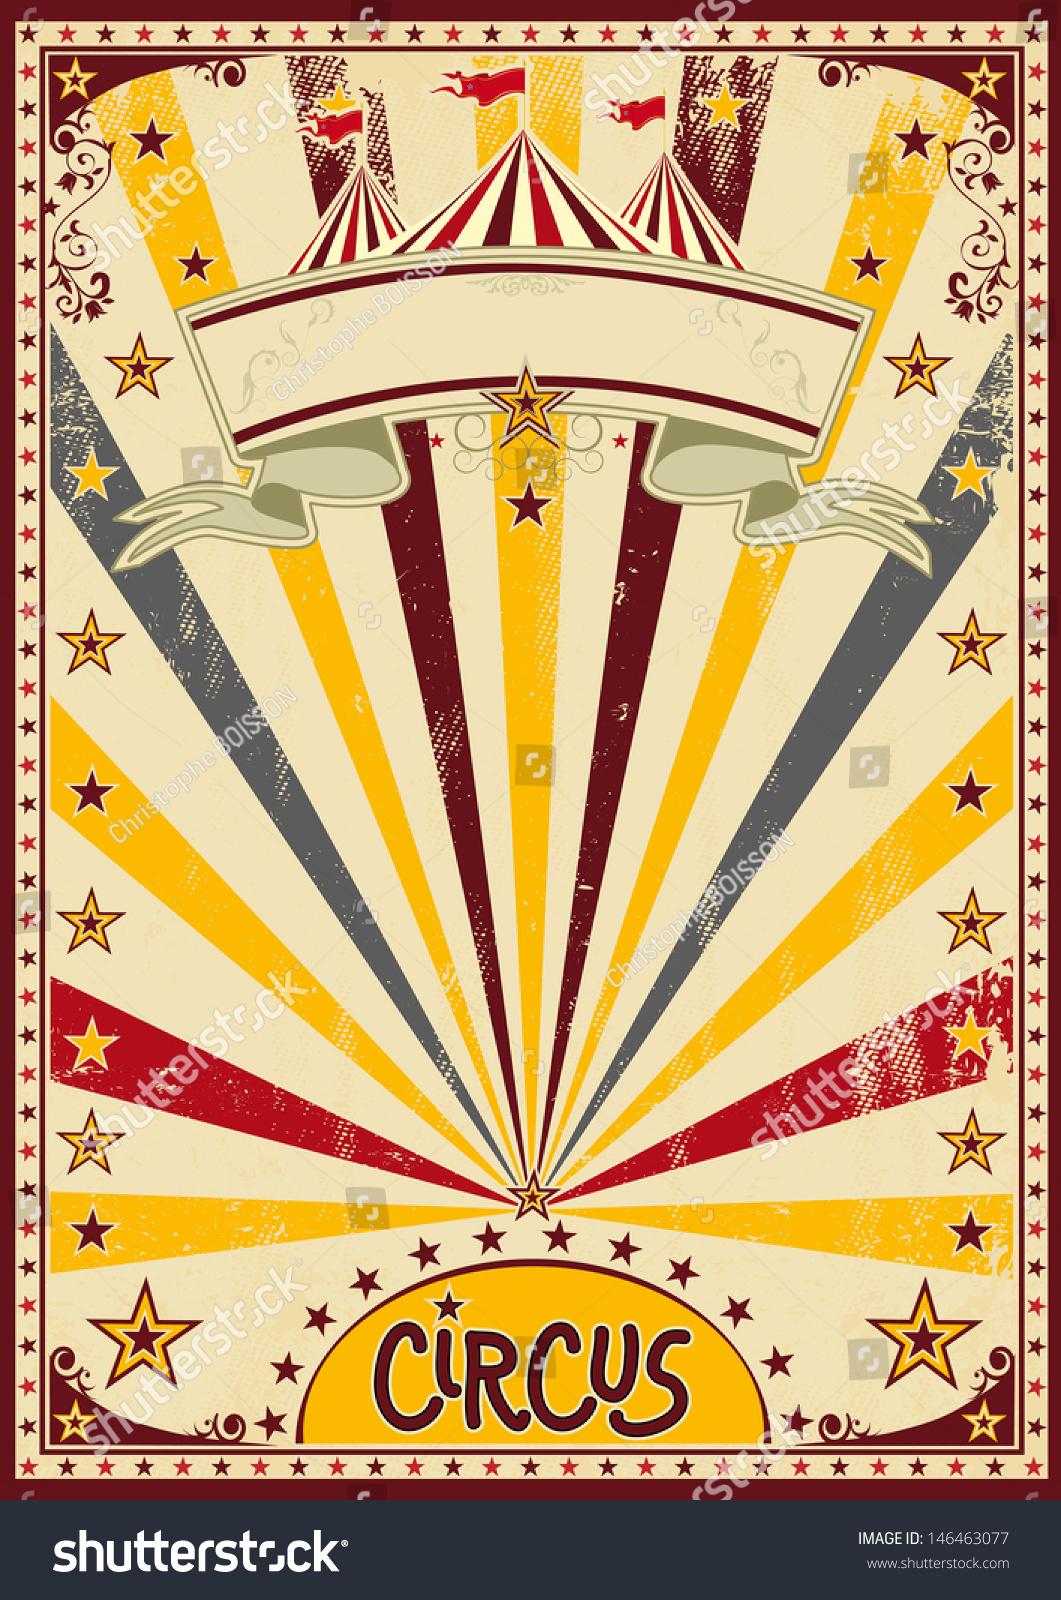 Circus Retro Circus Background Poster Grunge Stock Vector ...